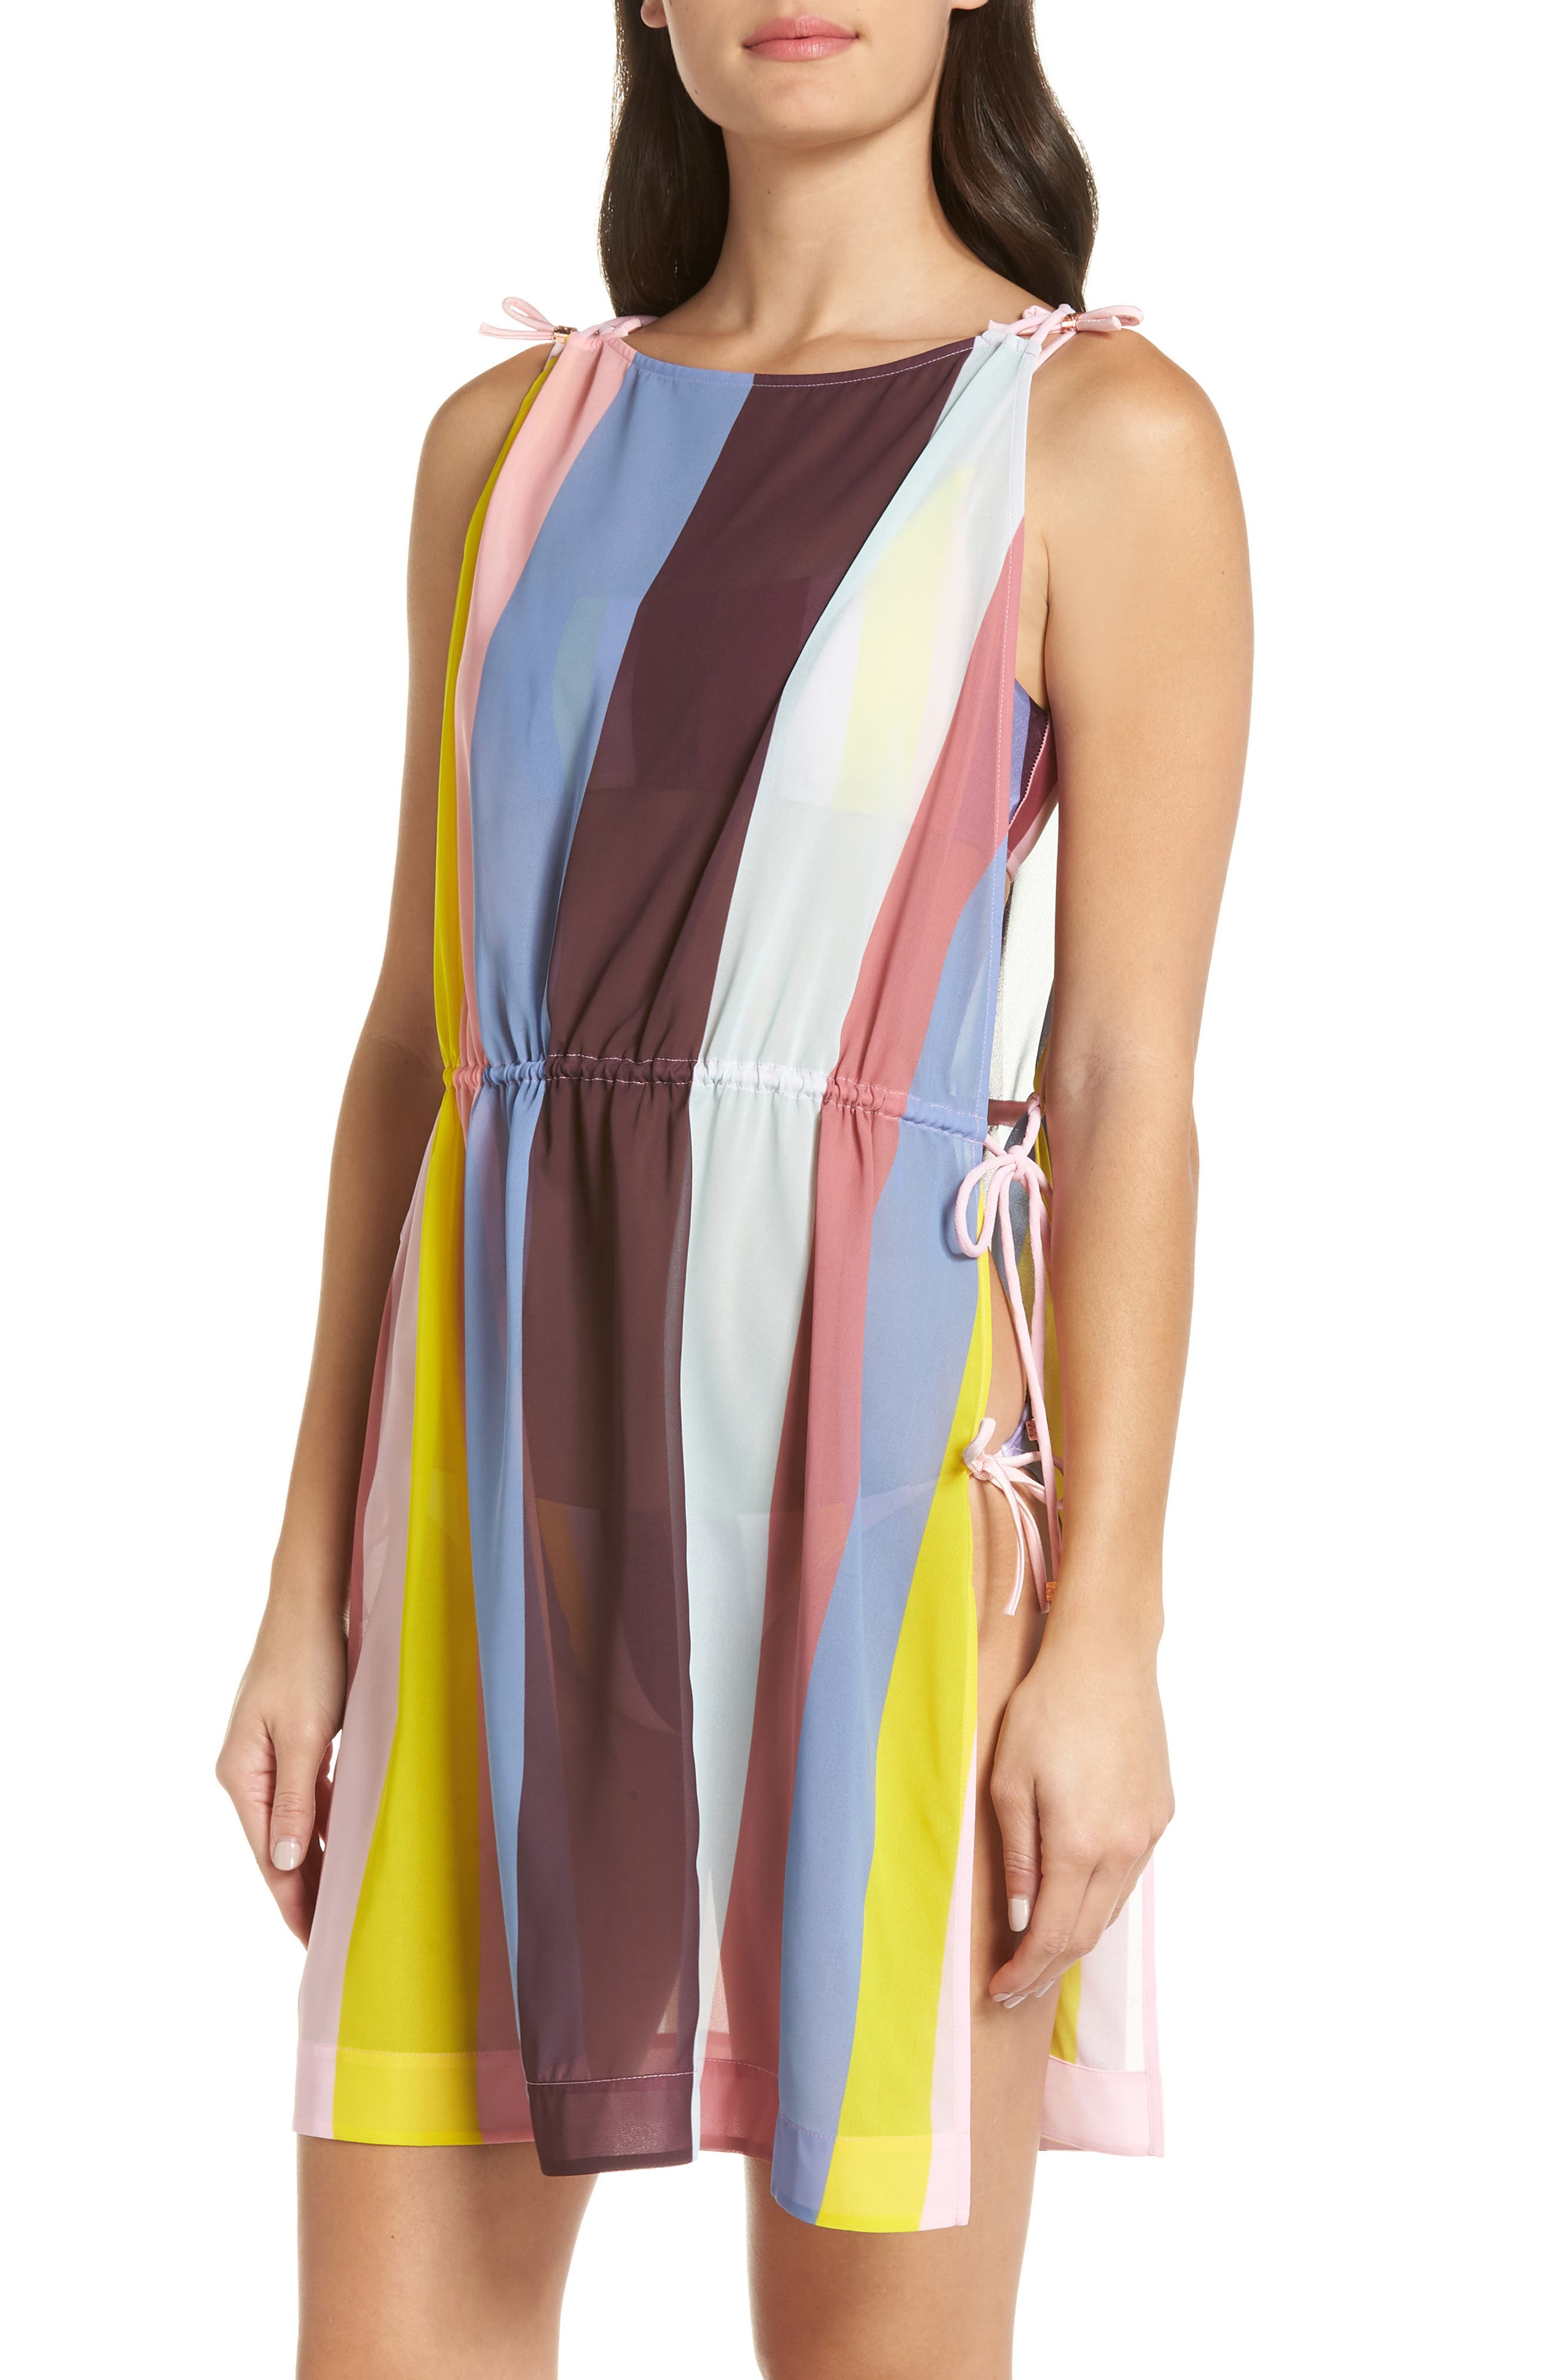 Penaree Rio Stripe Tabbard Cover-Up,                         Main,                         color, LIGHT PINK